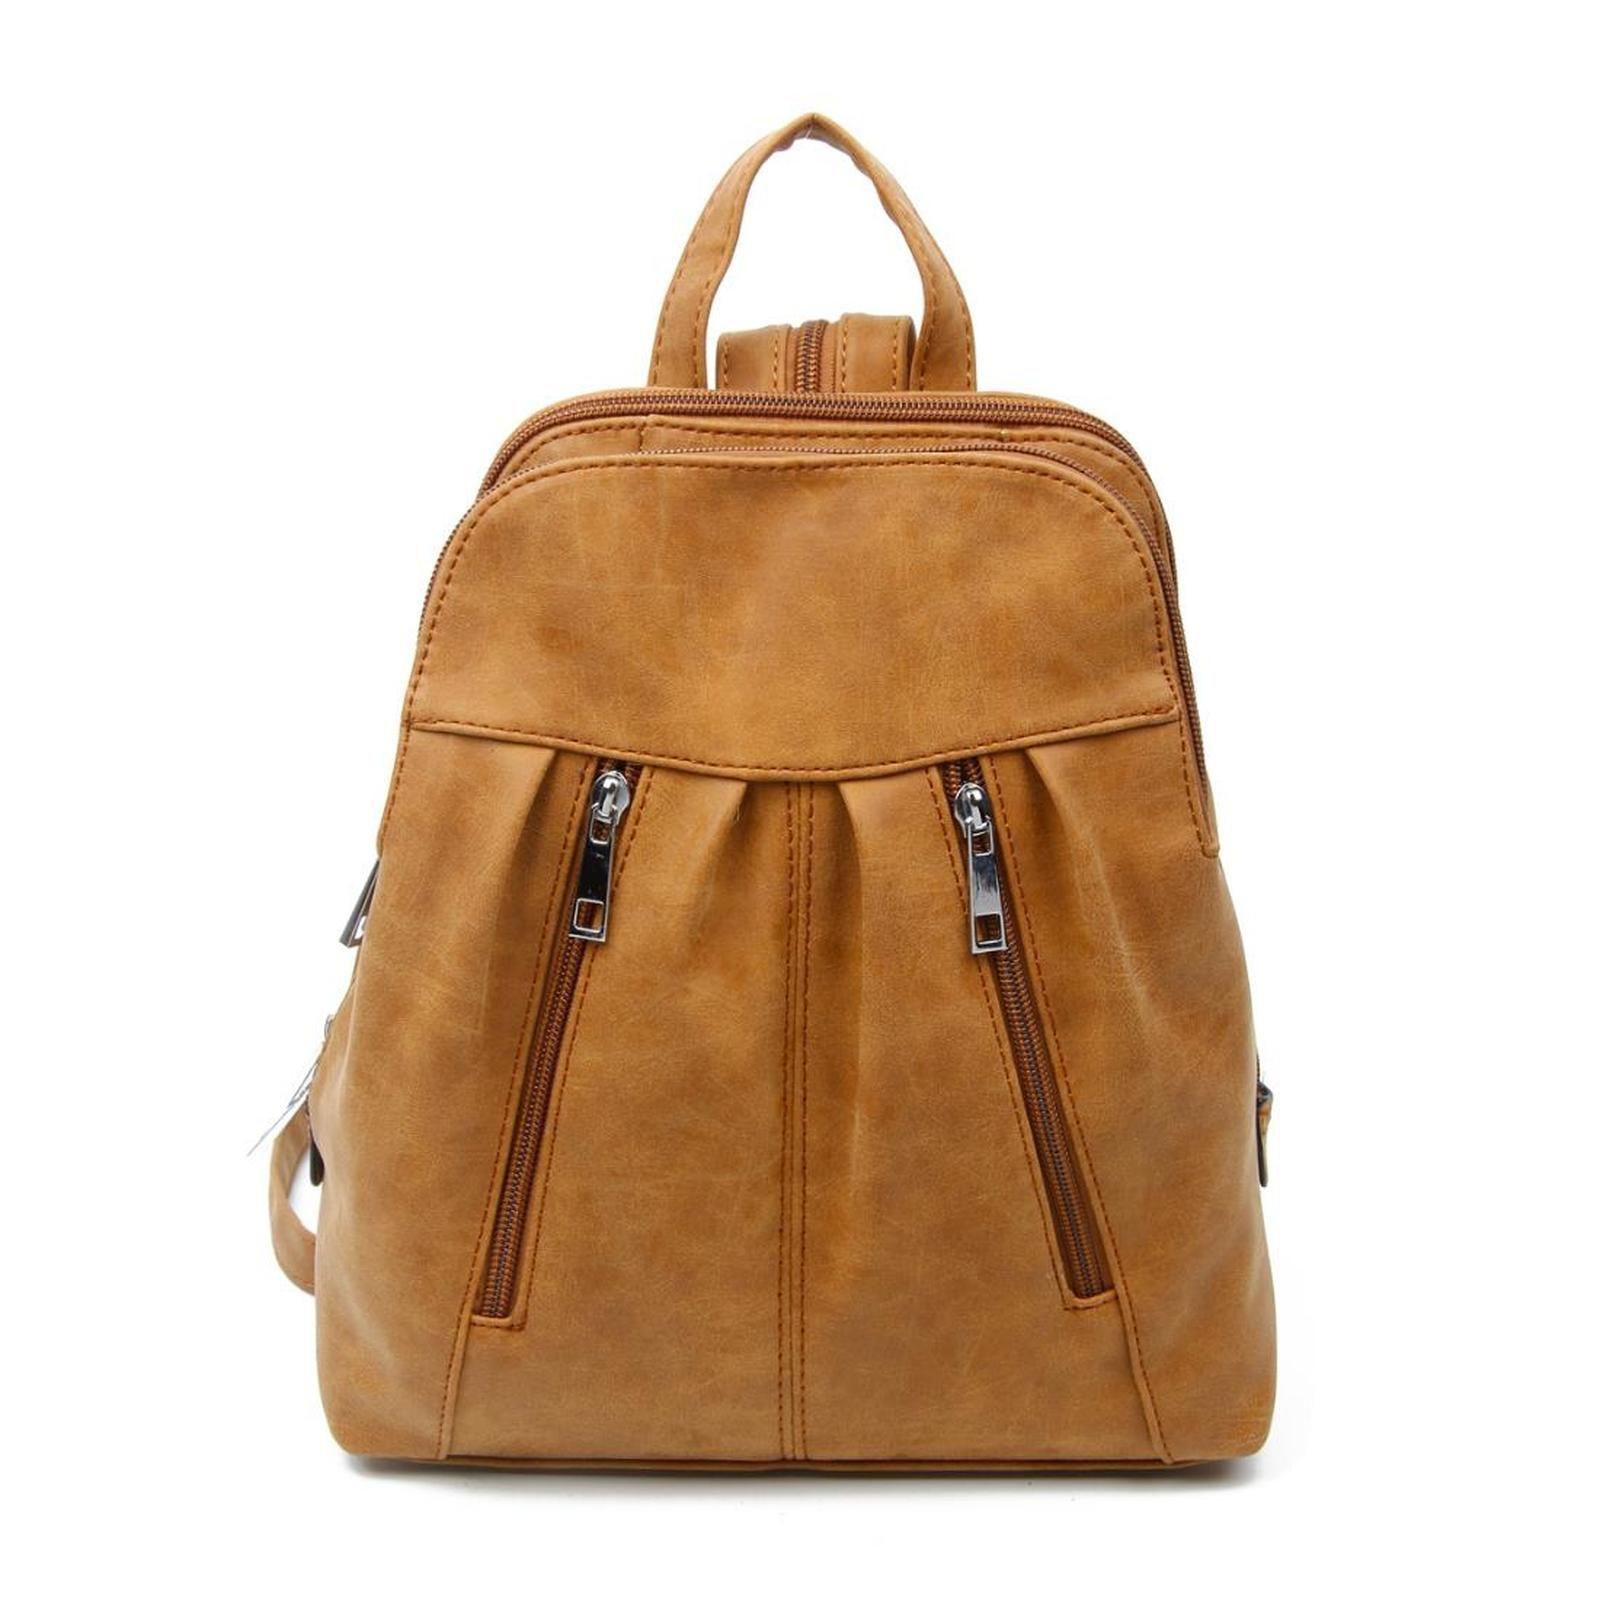 Photo of Women Backpack City Backpack Bag City Backpack BackPack Sc …